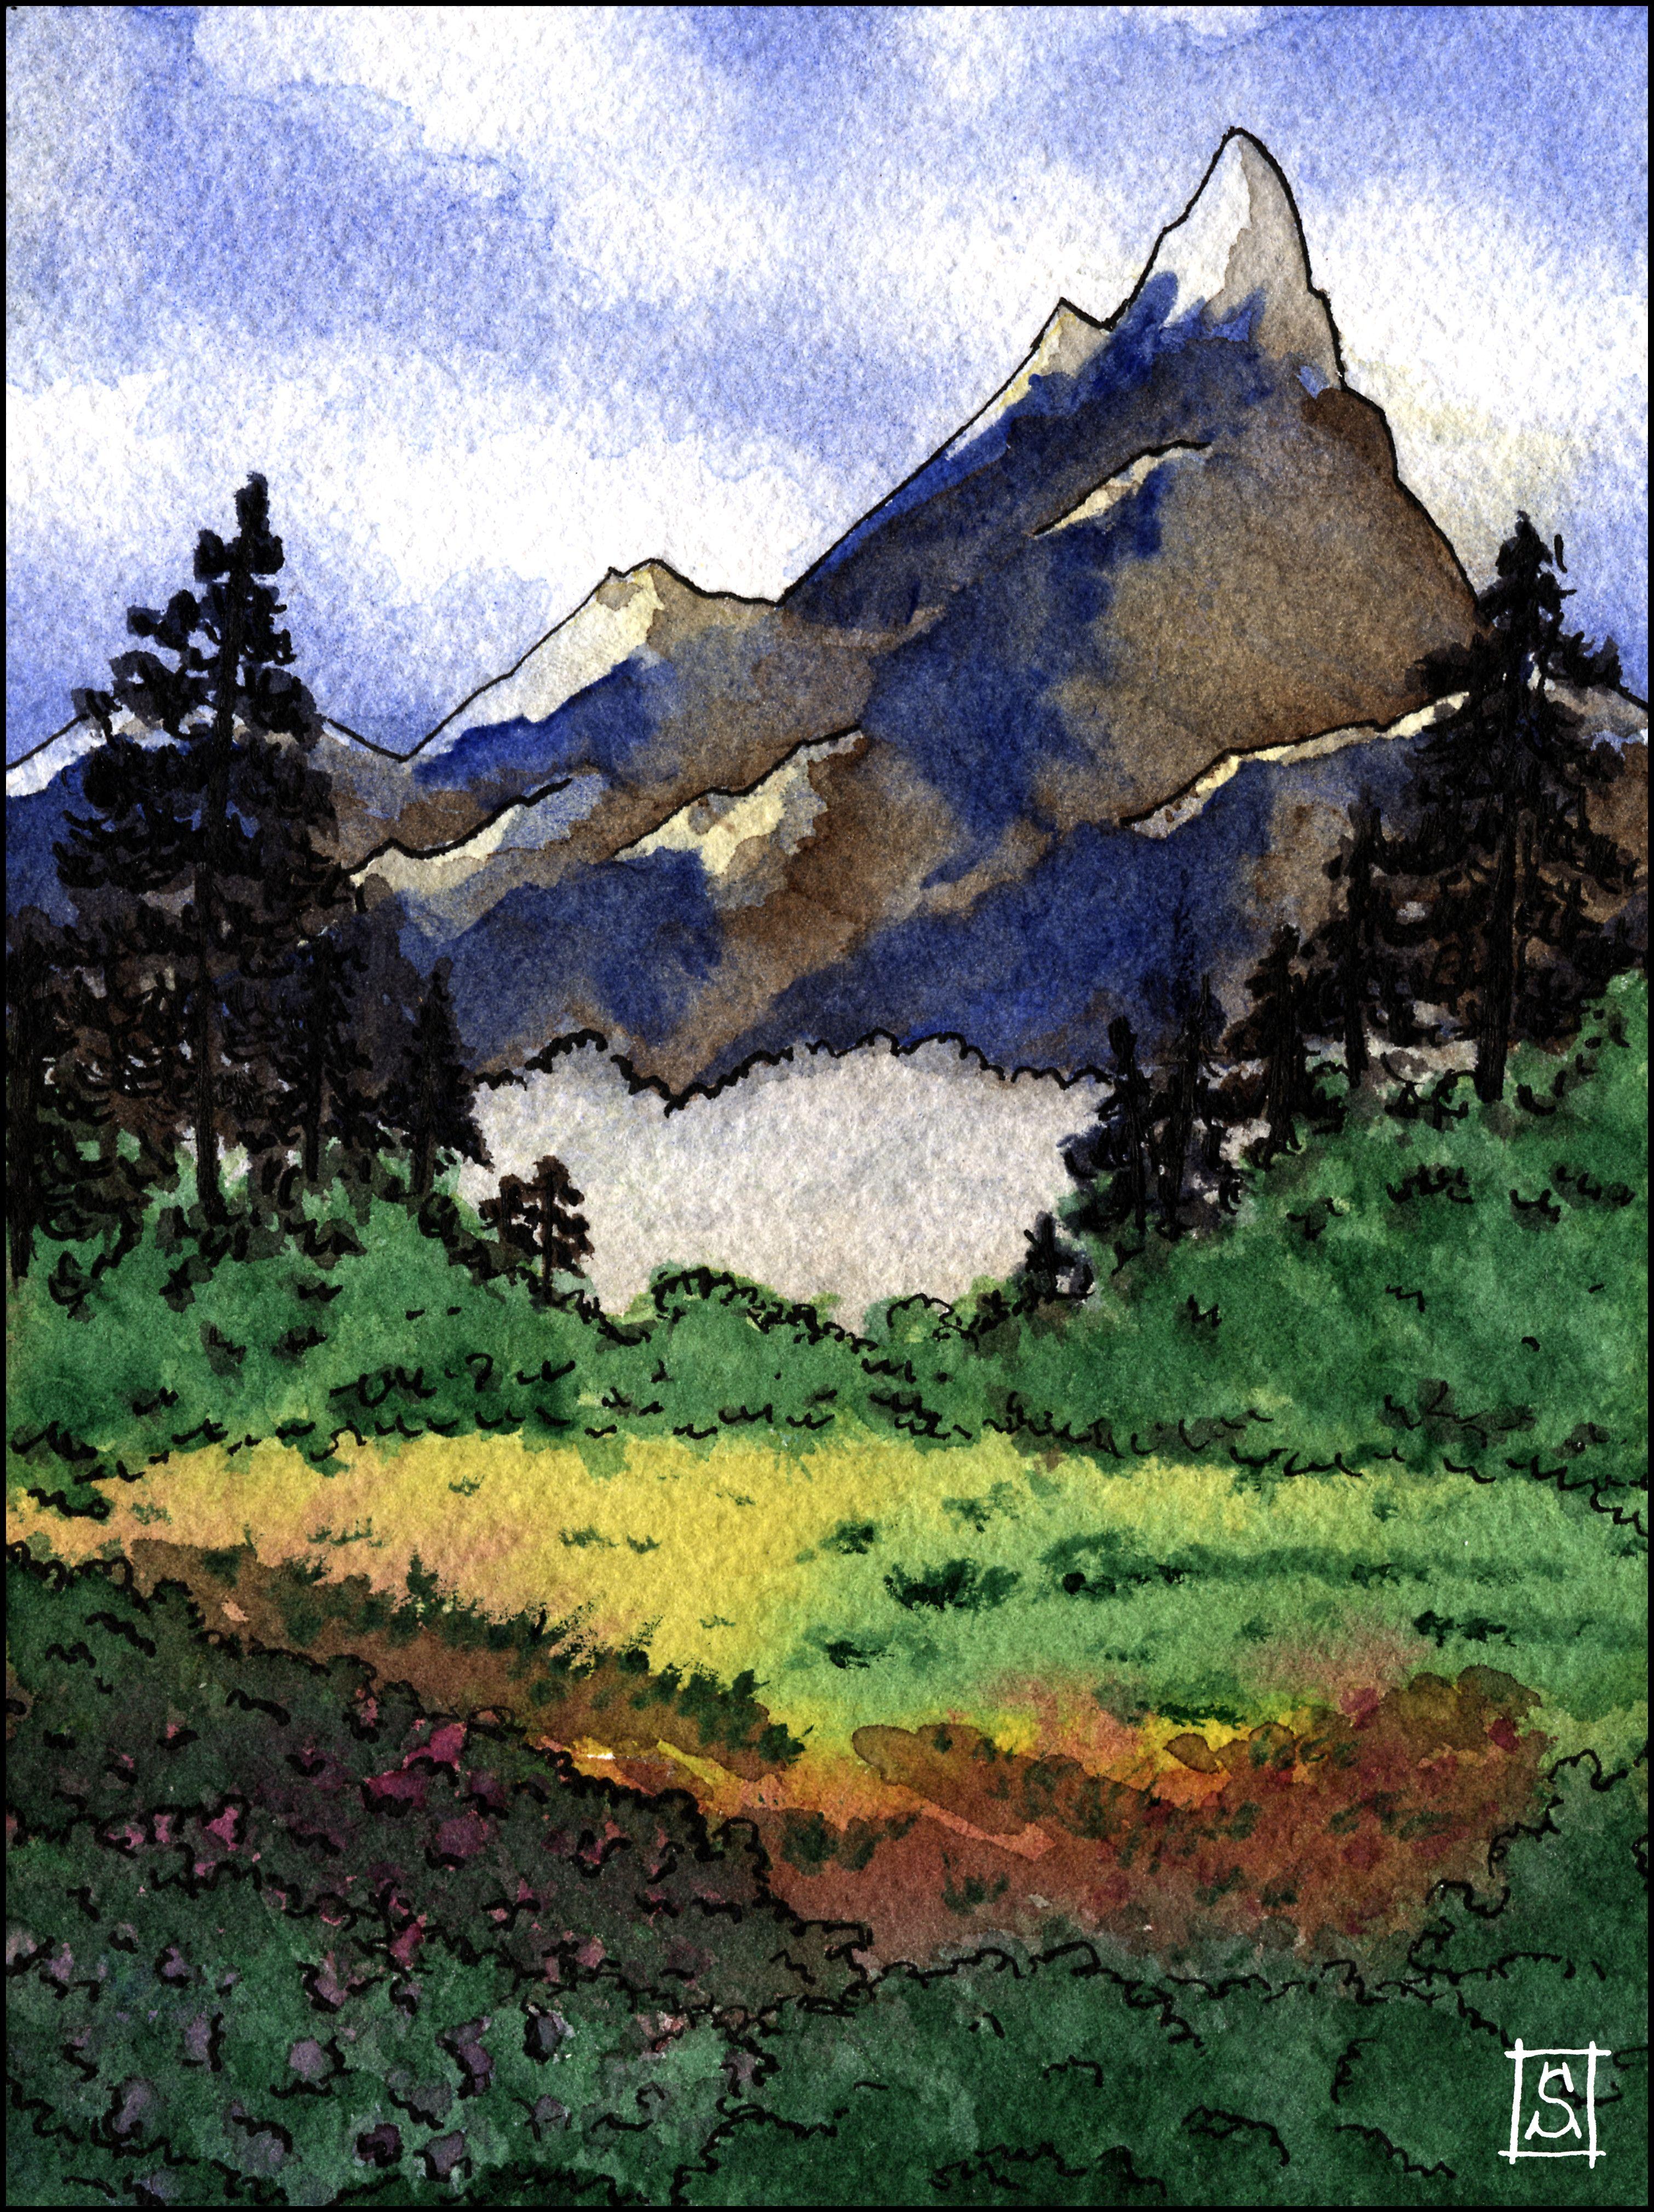 Paysage De Montagne 01 Mountain View 01 Paysage Montagne Paysage Chine Paysage